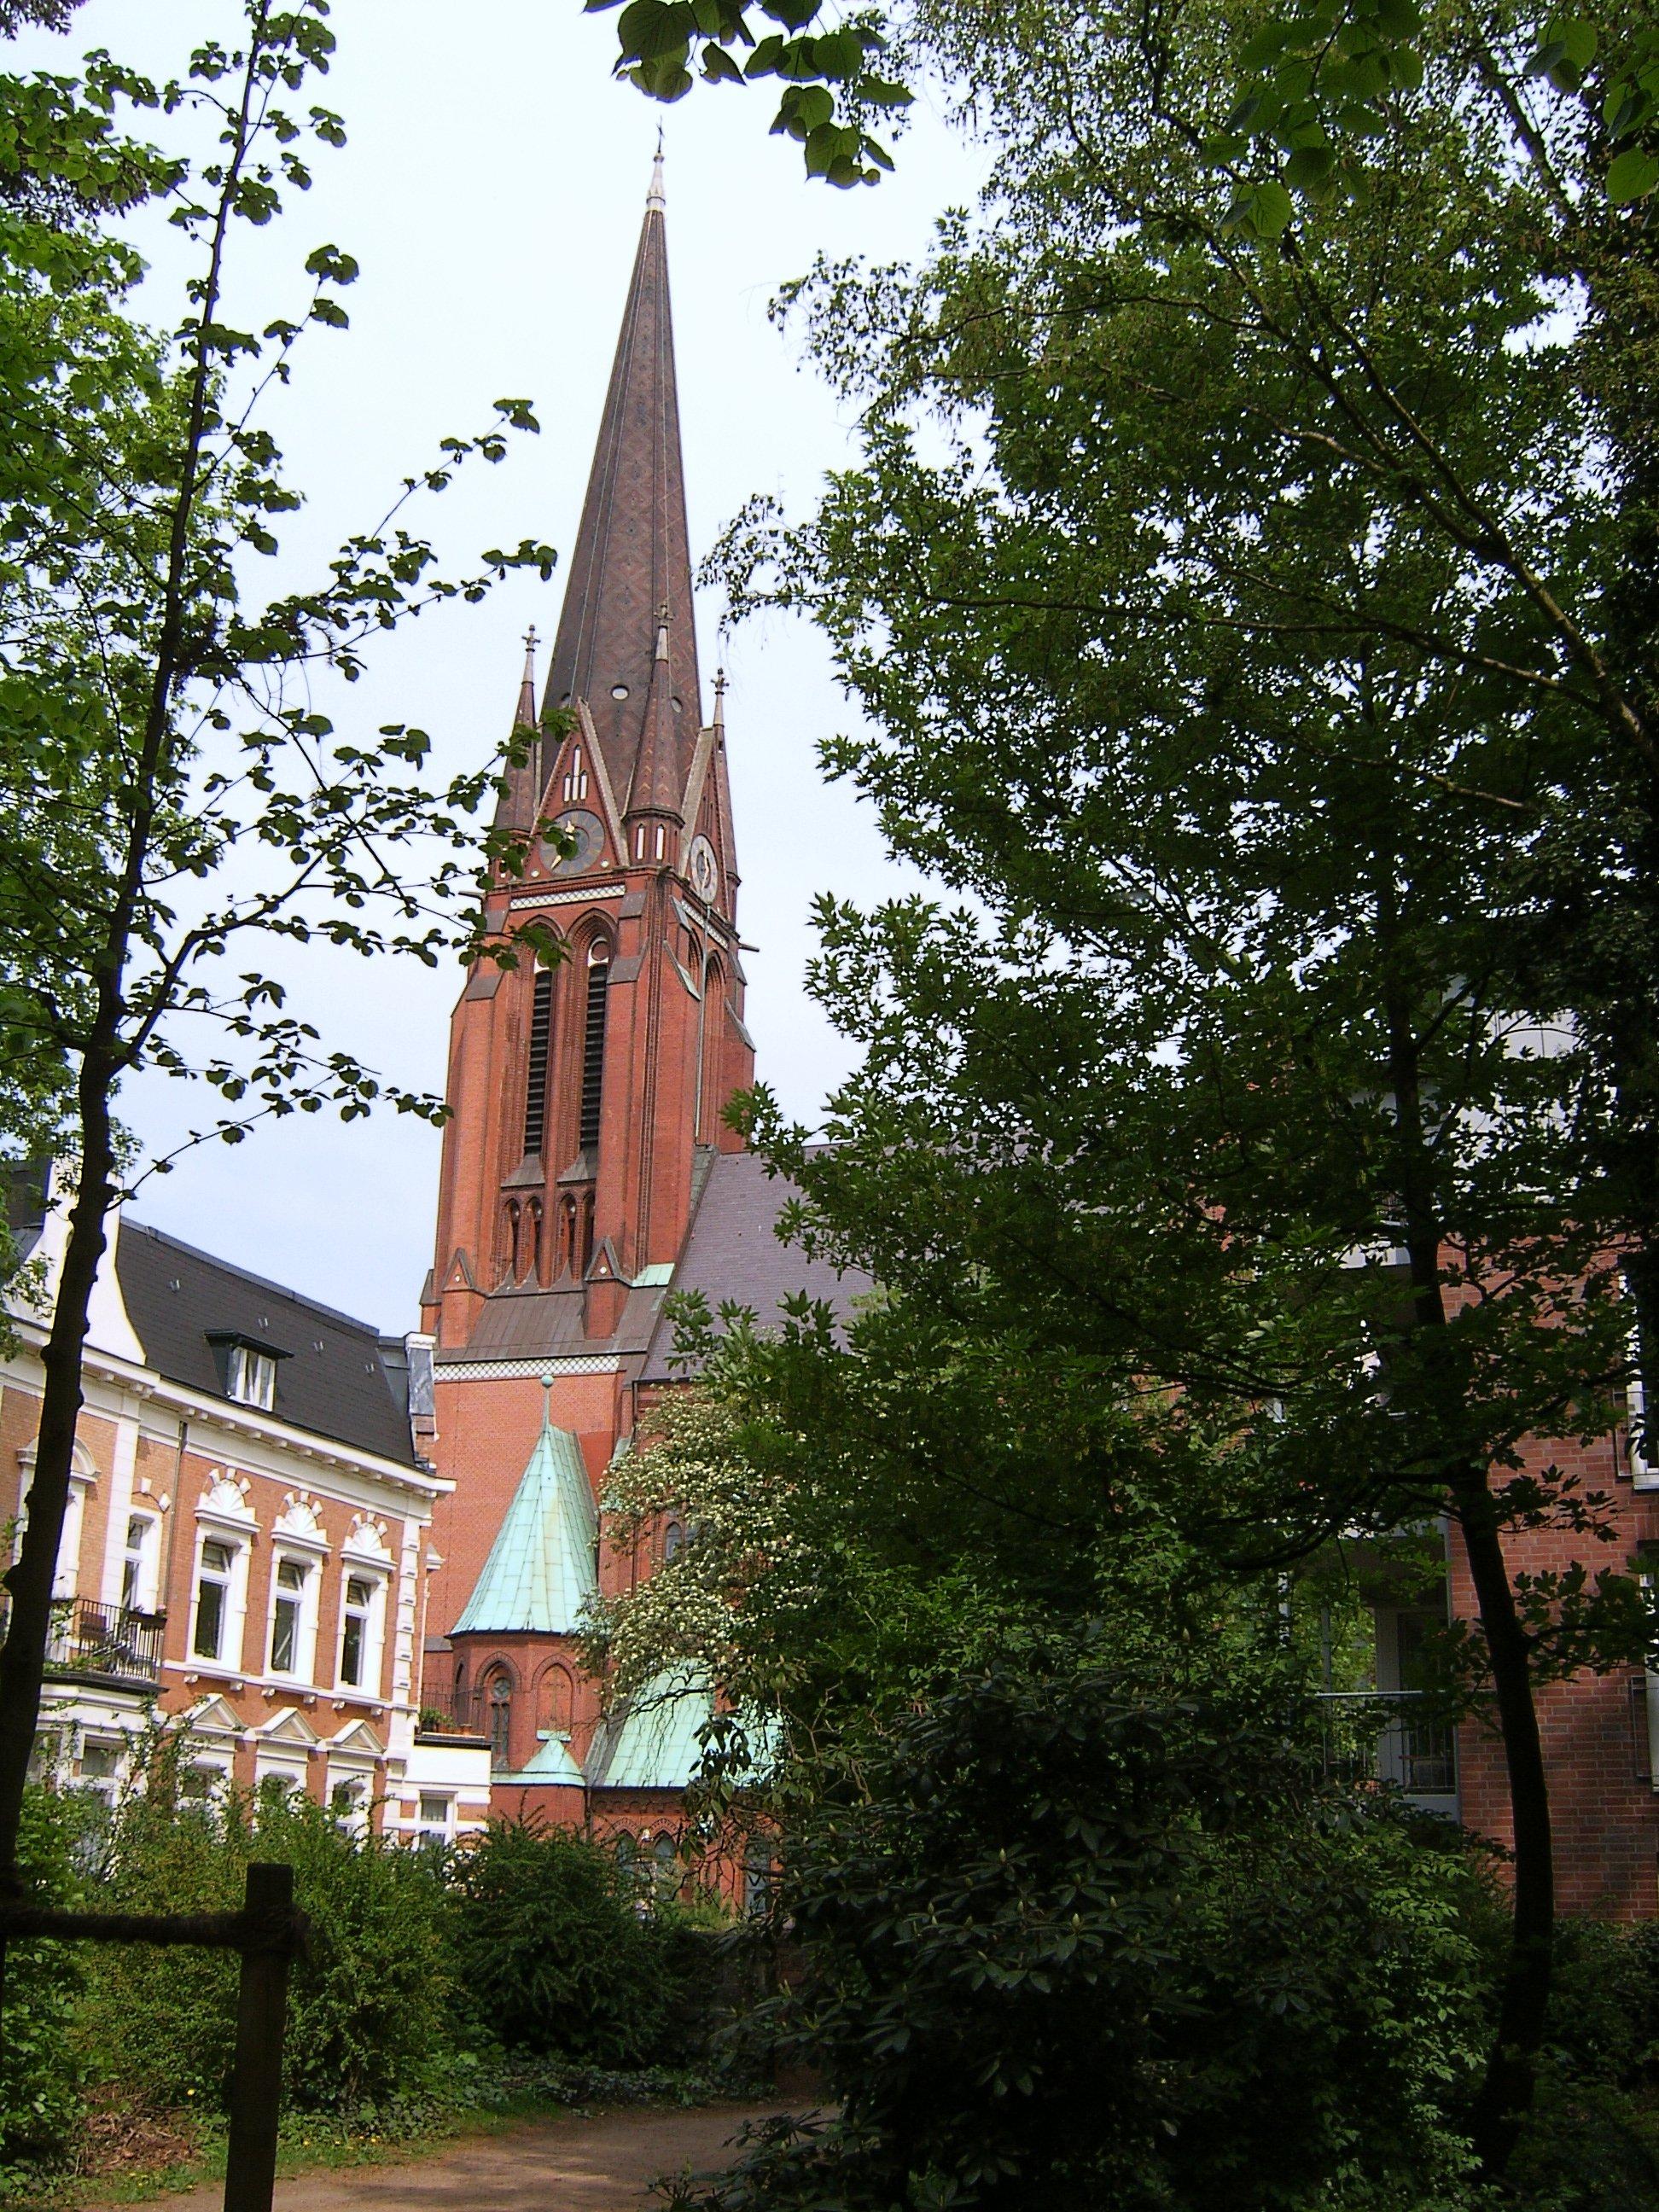 St. Johannis Altona